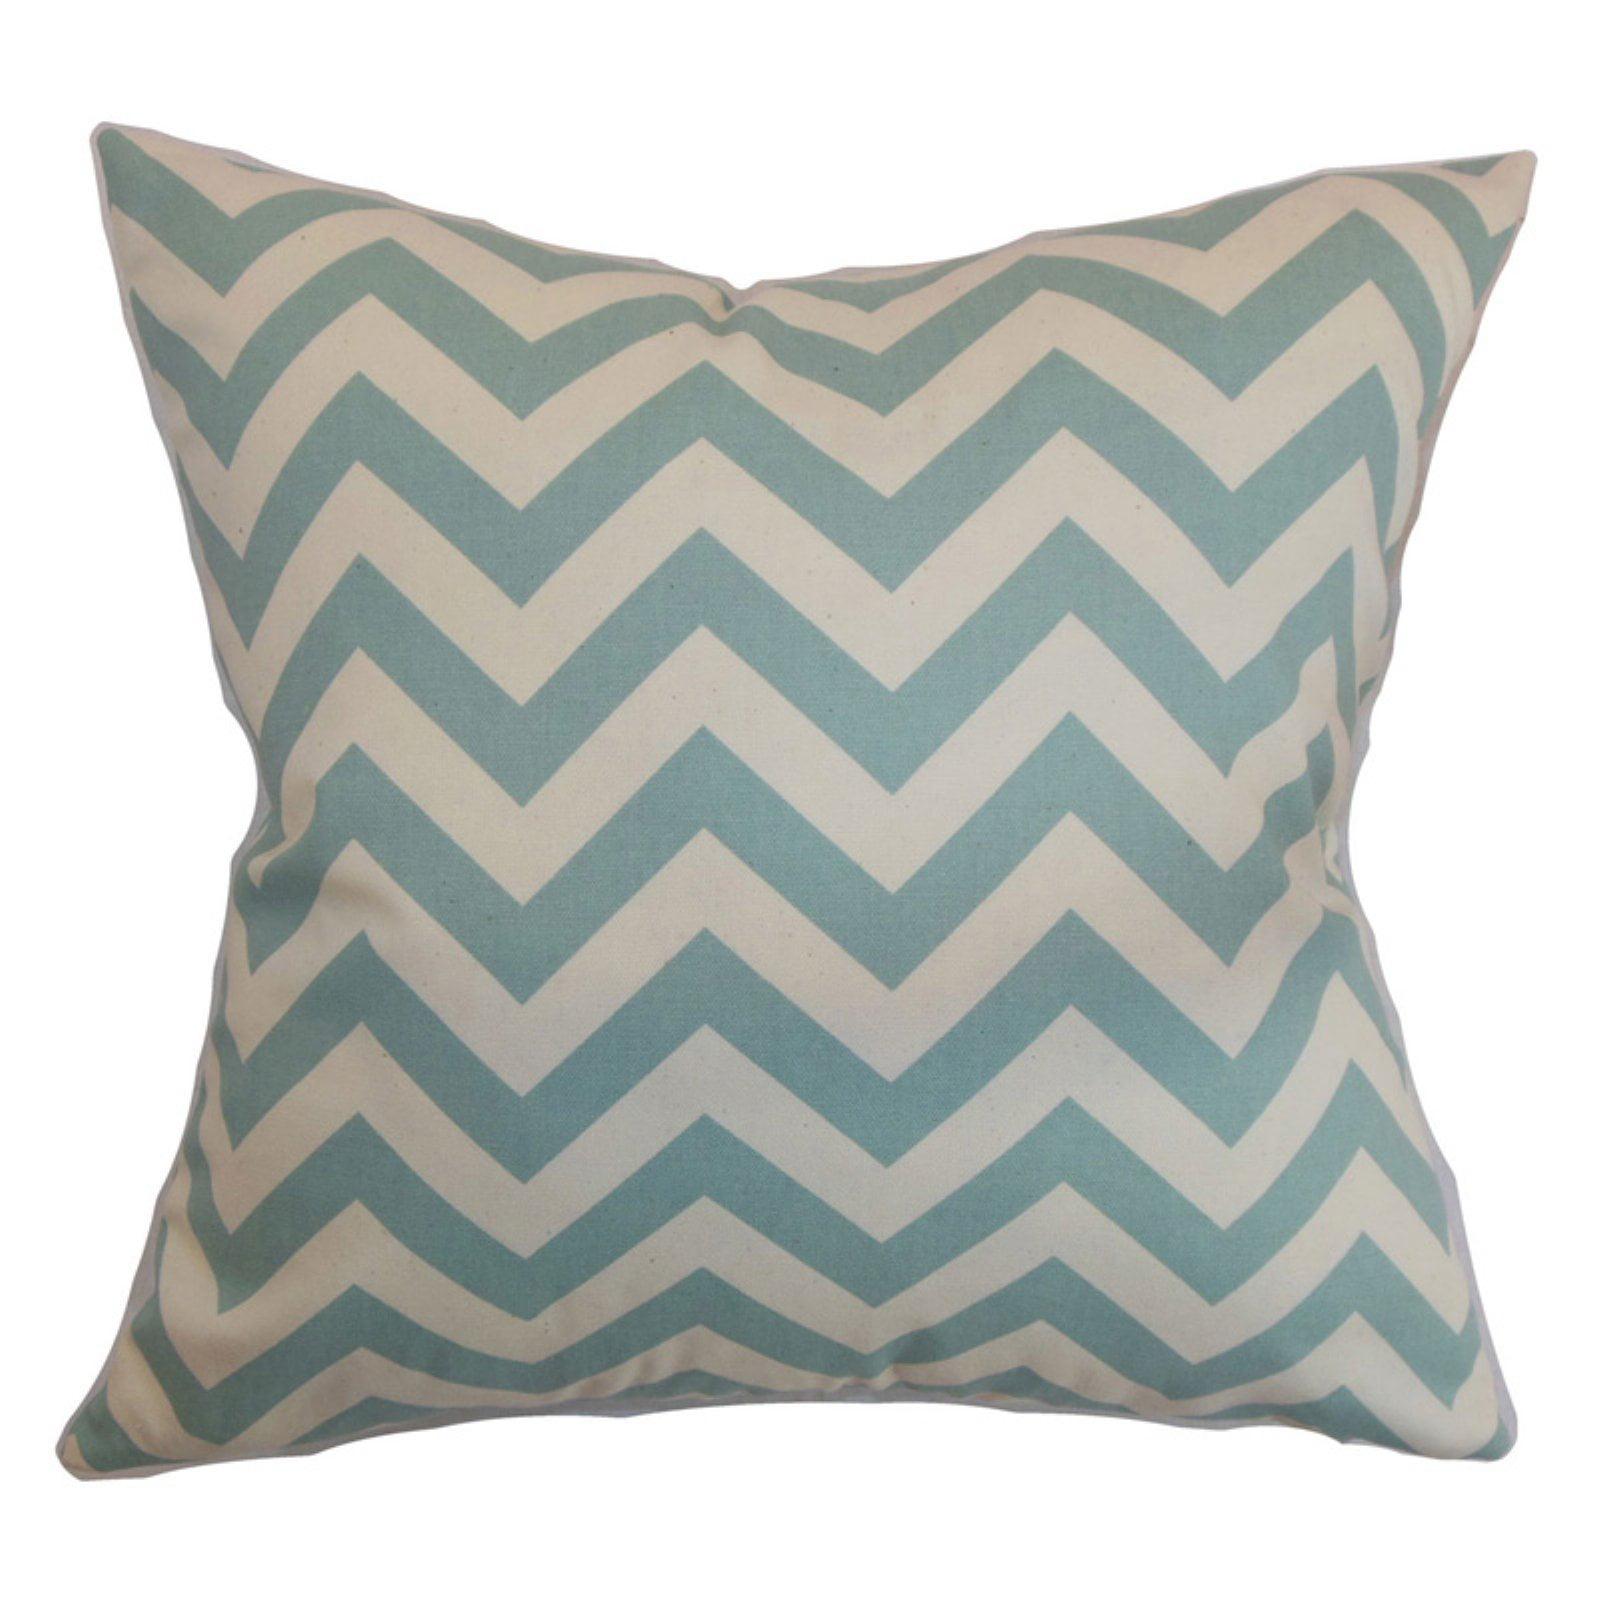 The Pillow Collection Xayabury Zigzag Pillow